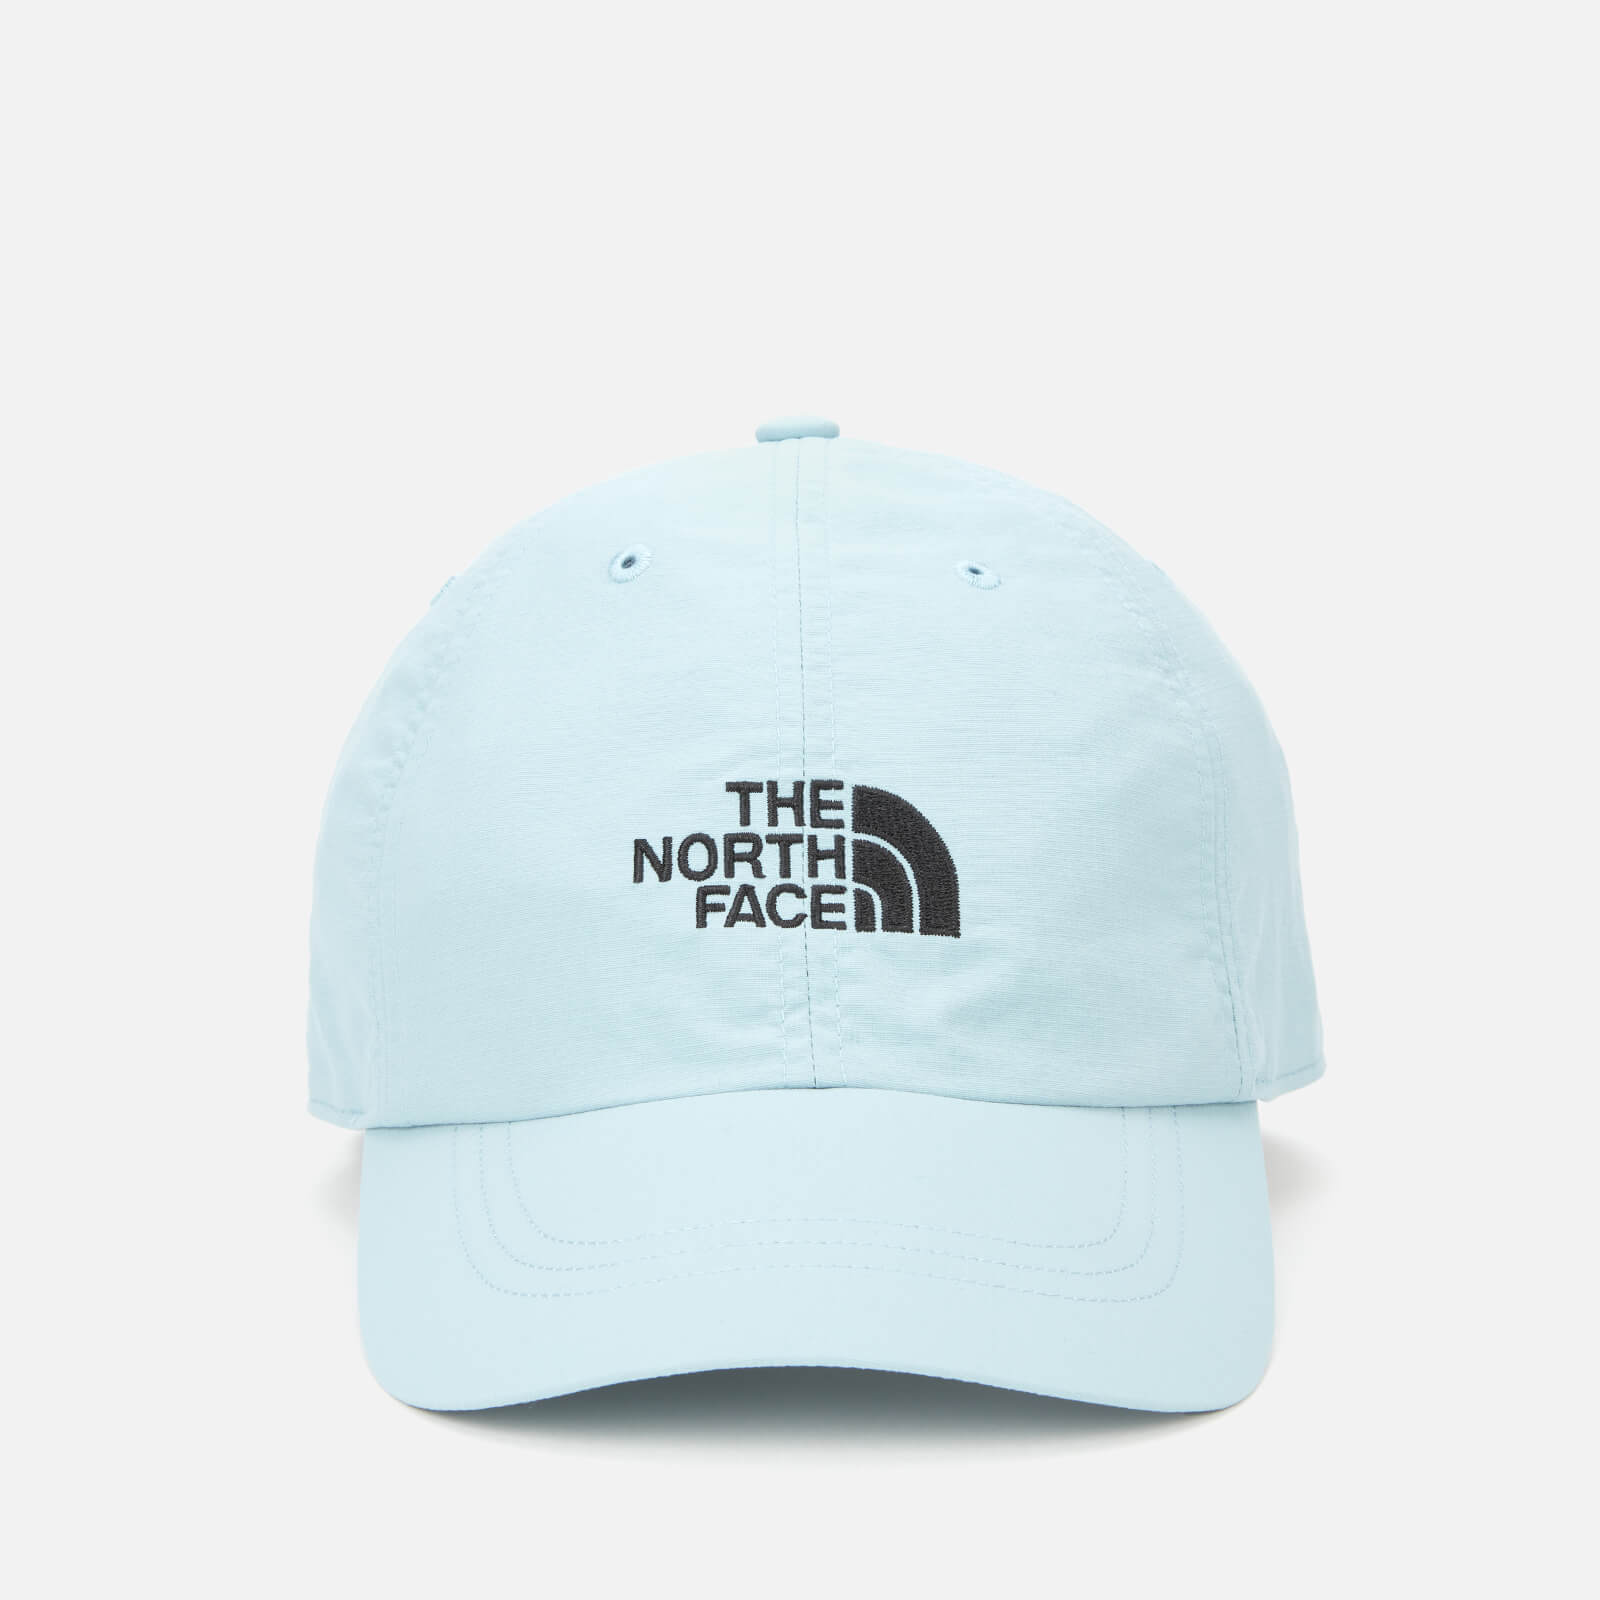 The North Face Horizon Cap - Tourmaline Blue